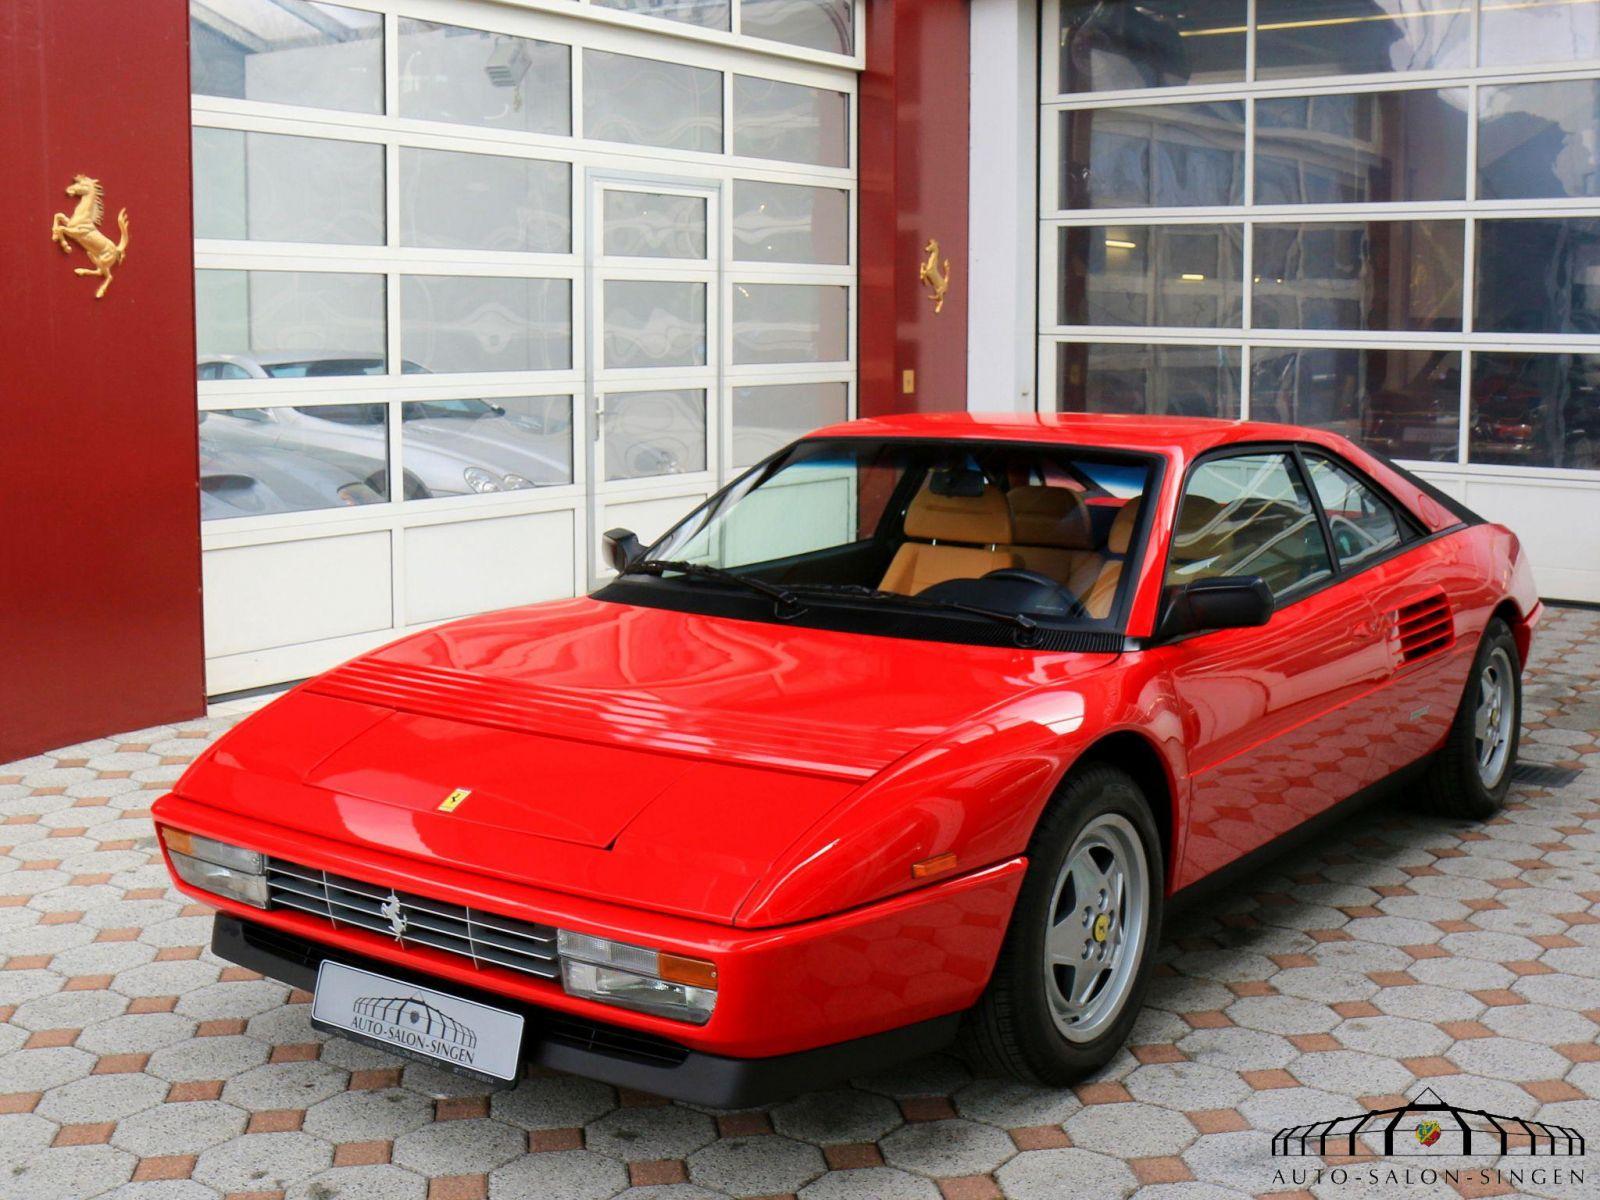 ferrari_mondial_8b9d45-1600x1200_crop Fabulous Ferrari Mondial T In Vendita Cars Trend